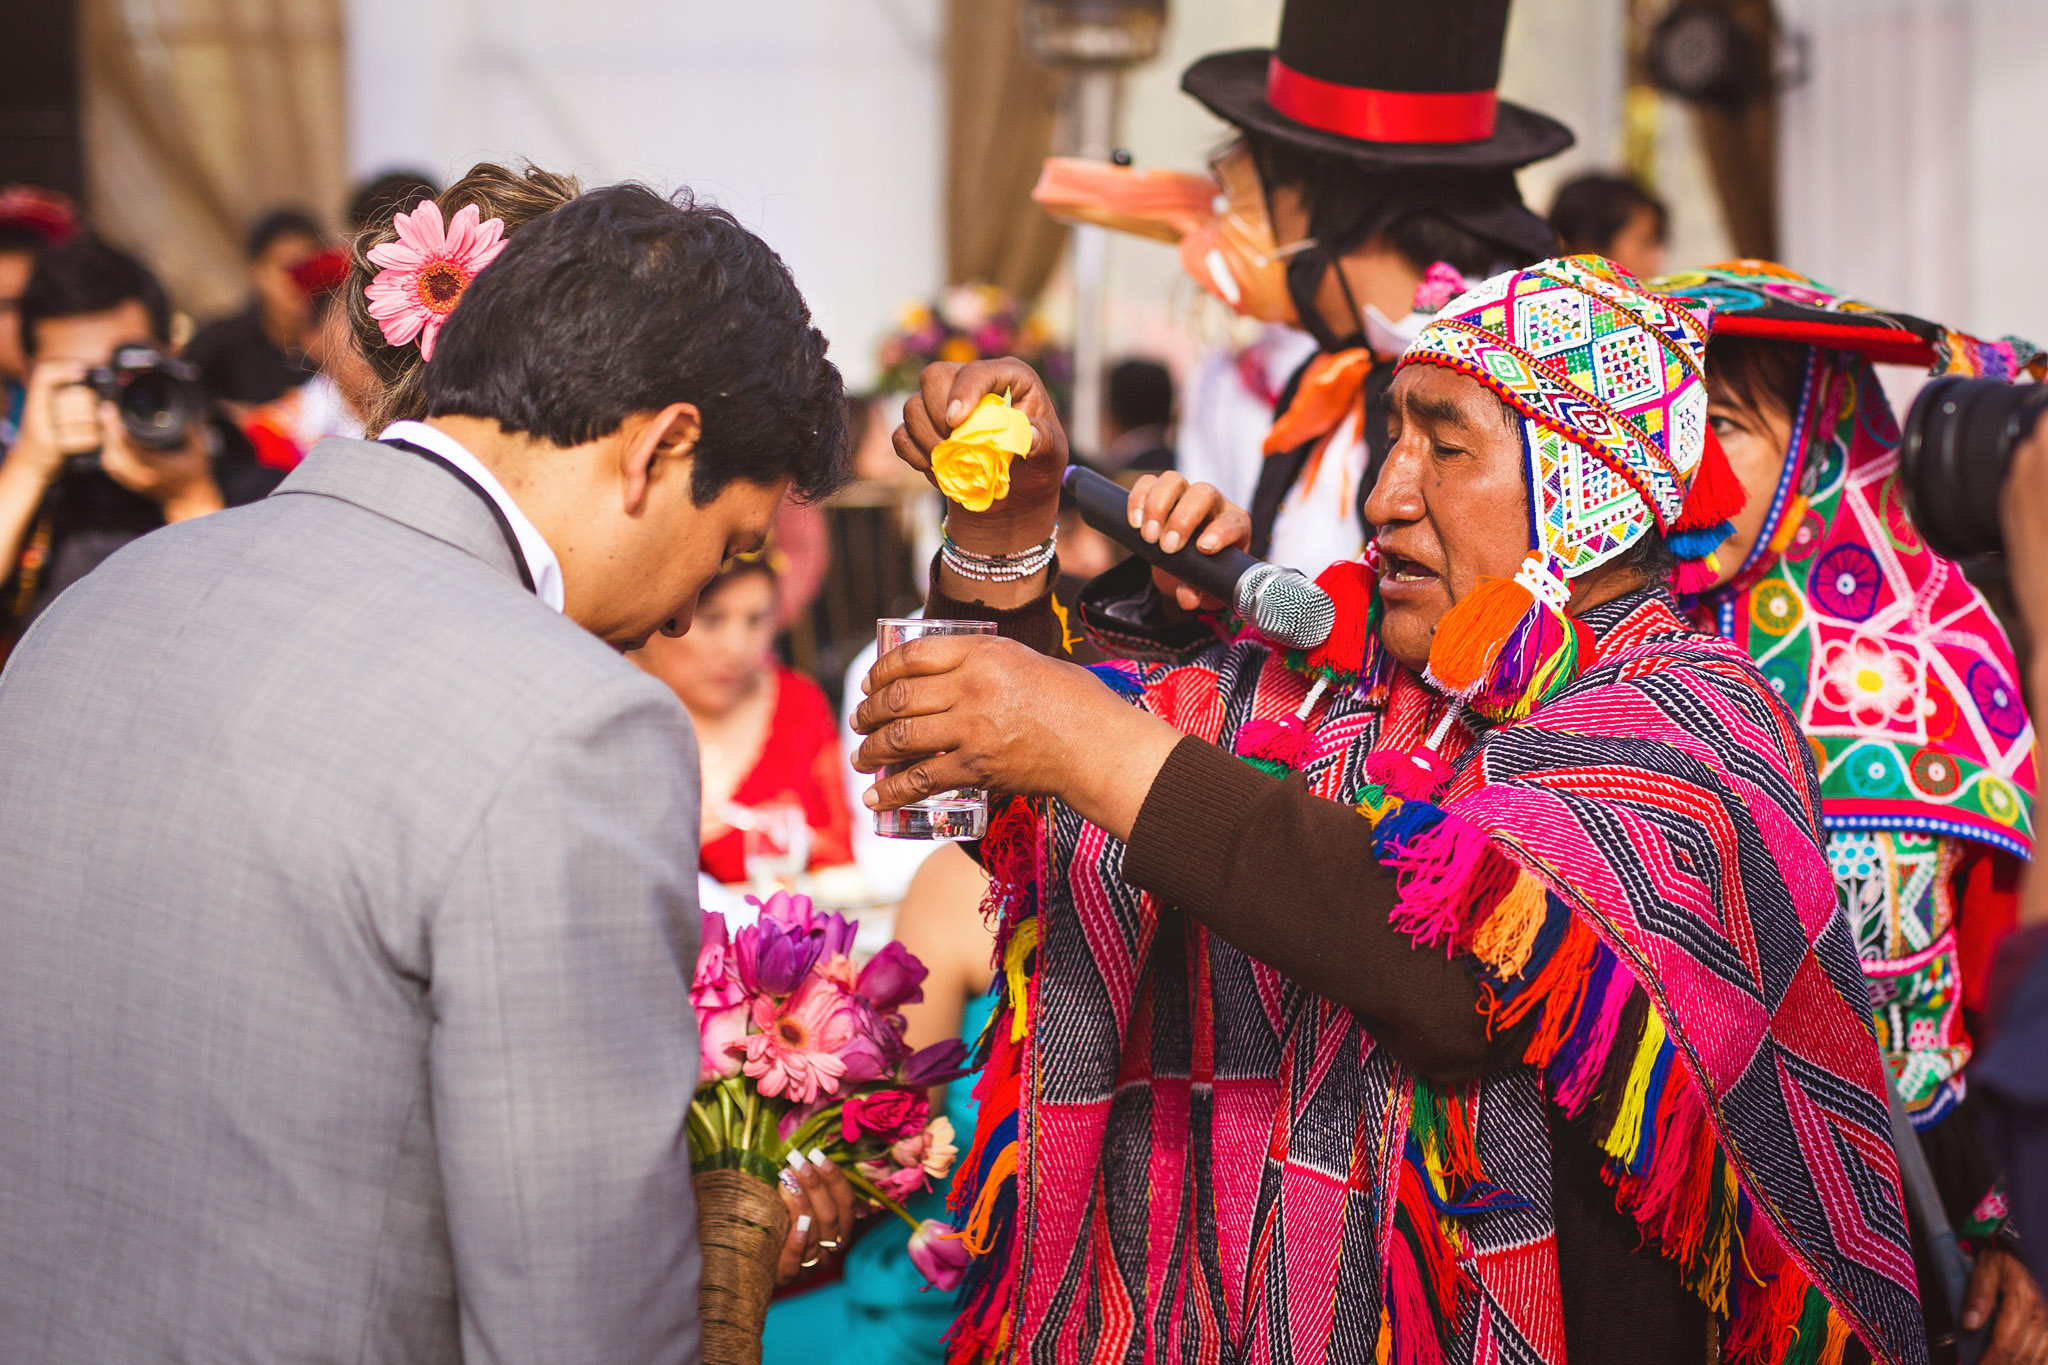 Wedding-Travellers-Destination-Wedding-Peru-Cusco-Hacienda-Sarapampa-Sacred-Valley-traditional-andean-ceremony-offer-pachamama-mother-earth-shaman